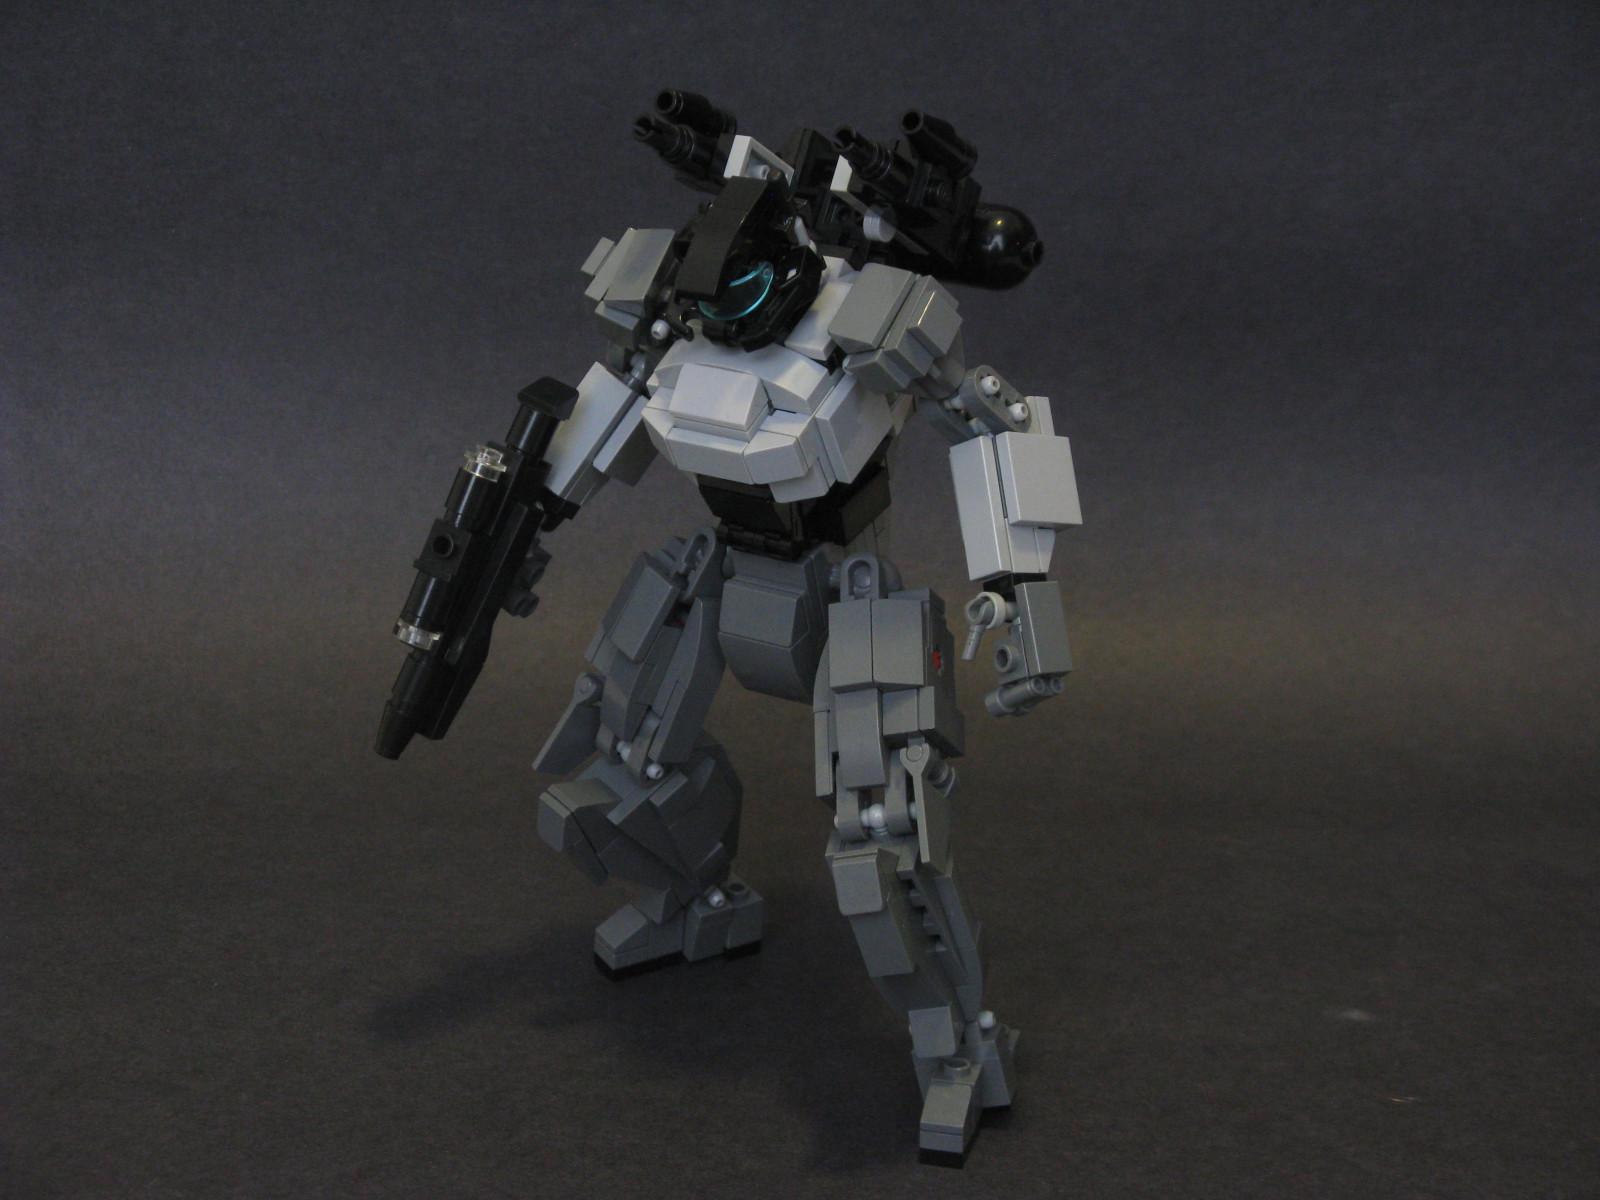 Hintergrundbilder : Roboter, LEGO, Mech, Technologie, Militär ...